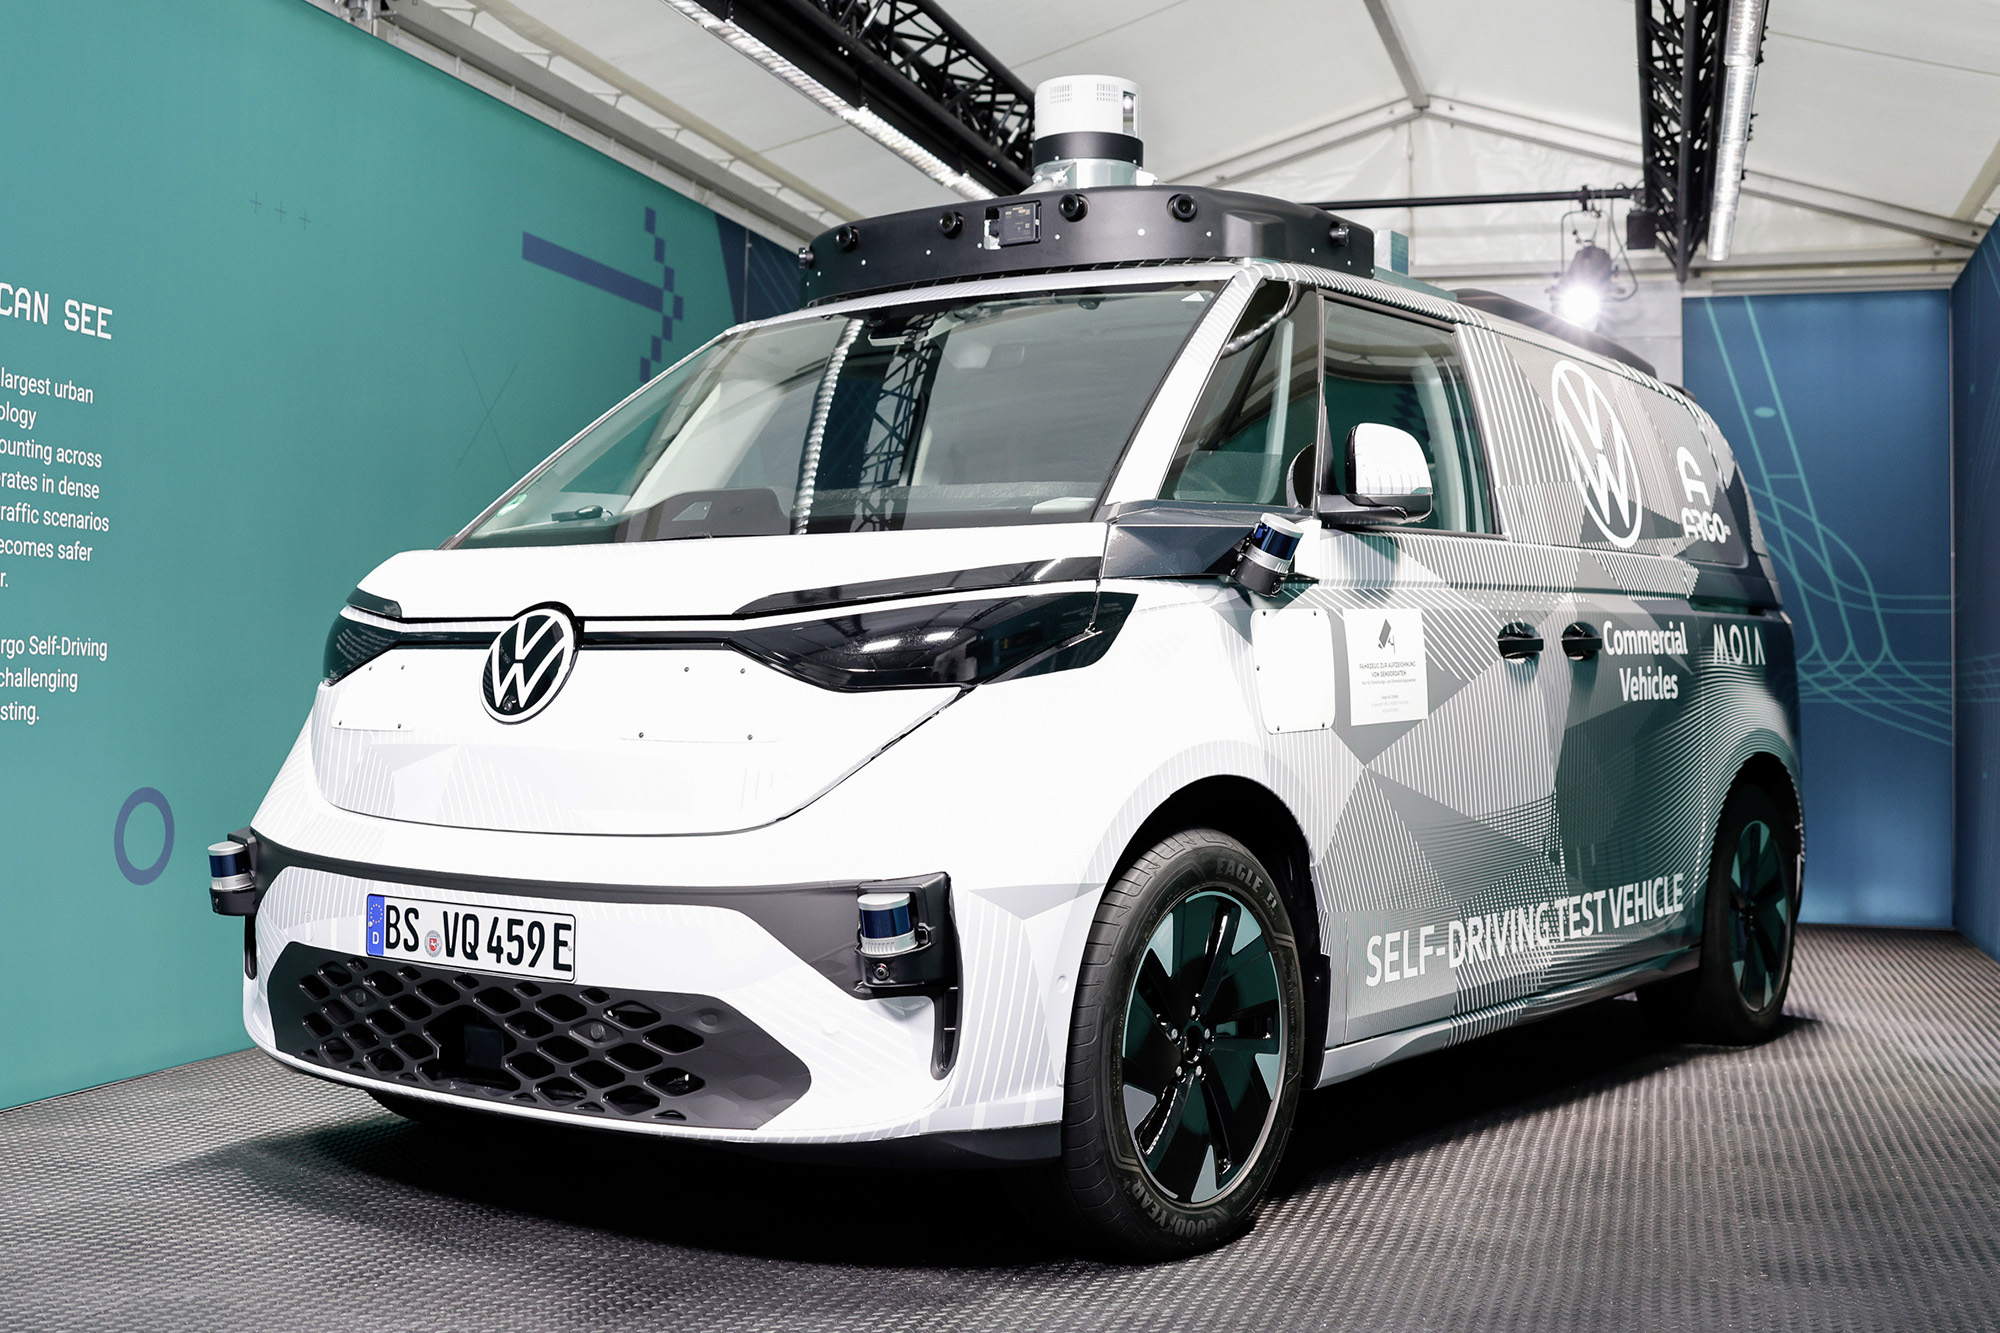 VW ID.Buzz autônoma de teste vista 3/4 de frente